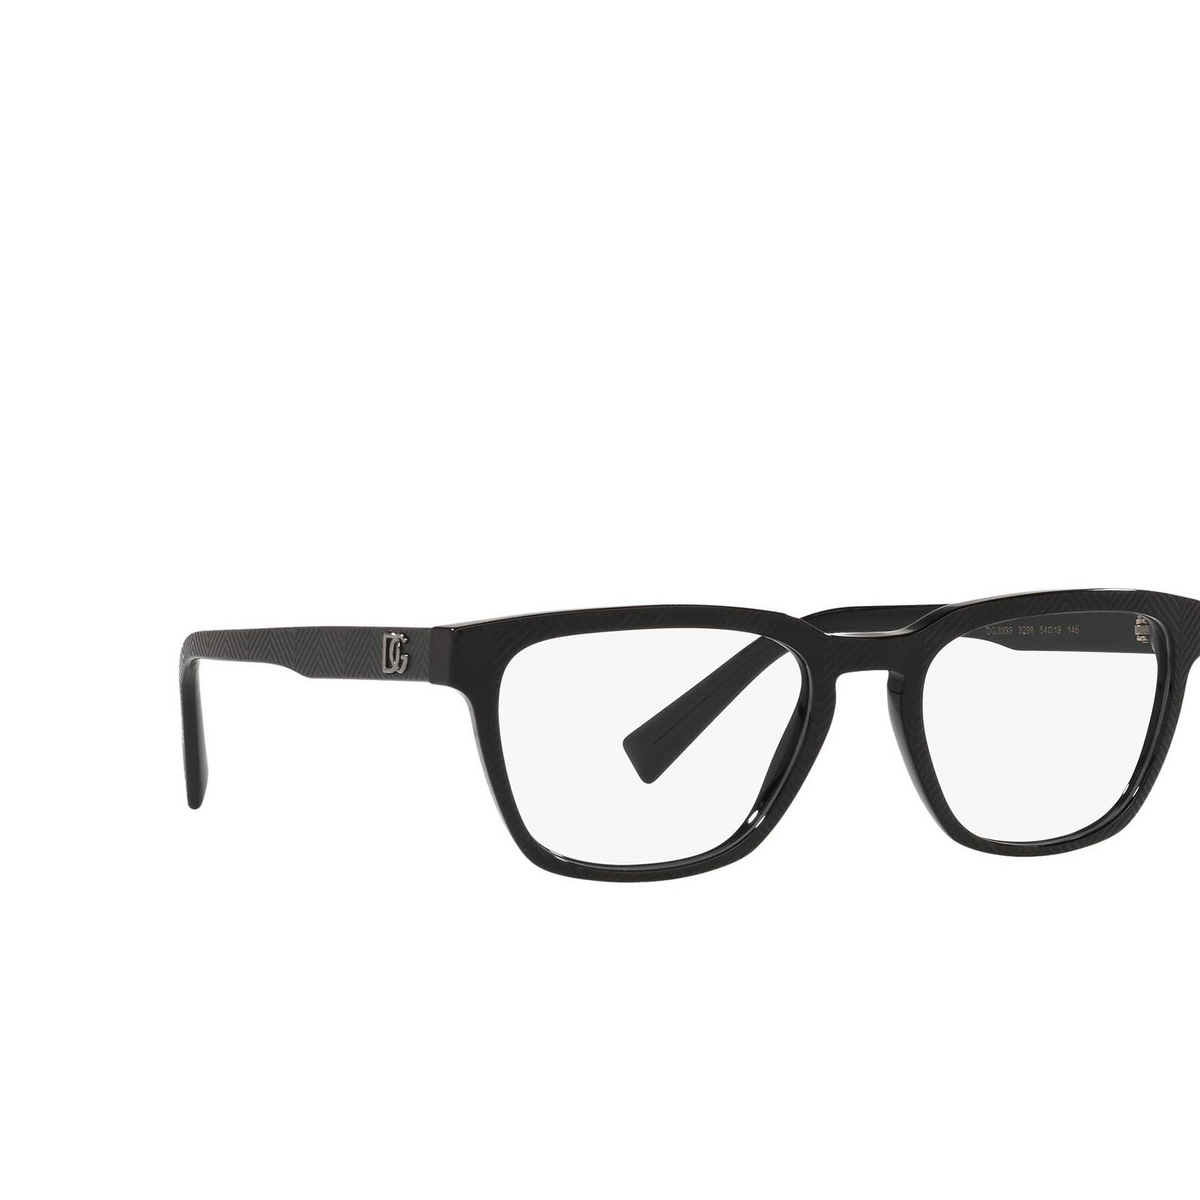 Dolce & Gabbana® Square Eyeglasses: DG3333 color Nero Texture Spigato 3298 - three-quarters view.